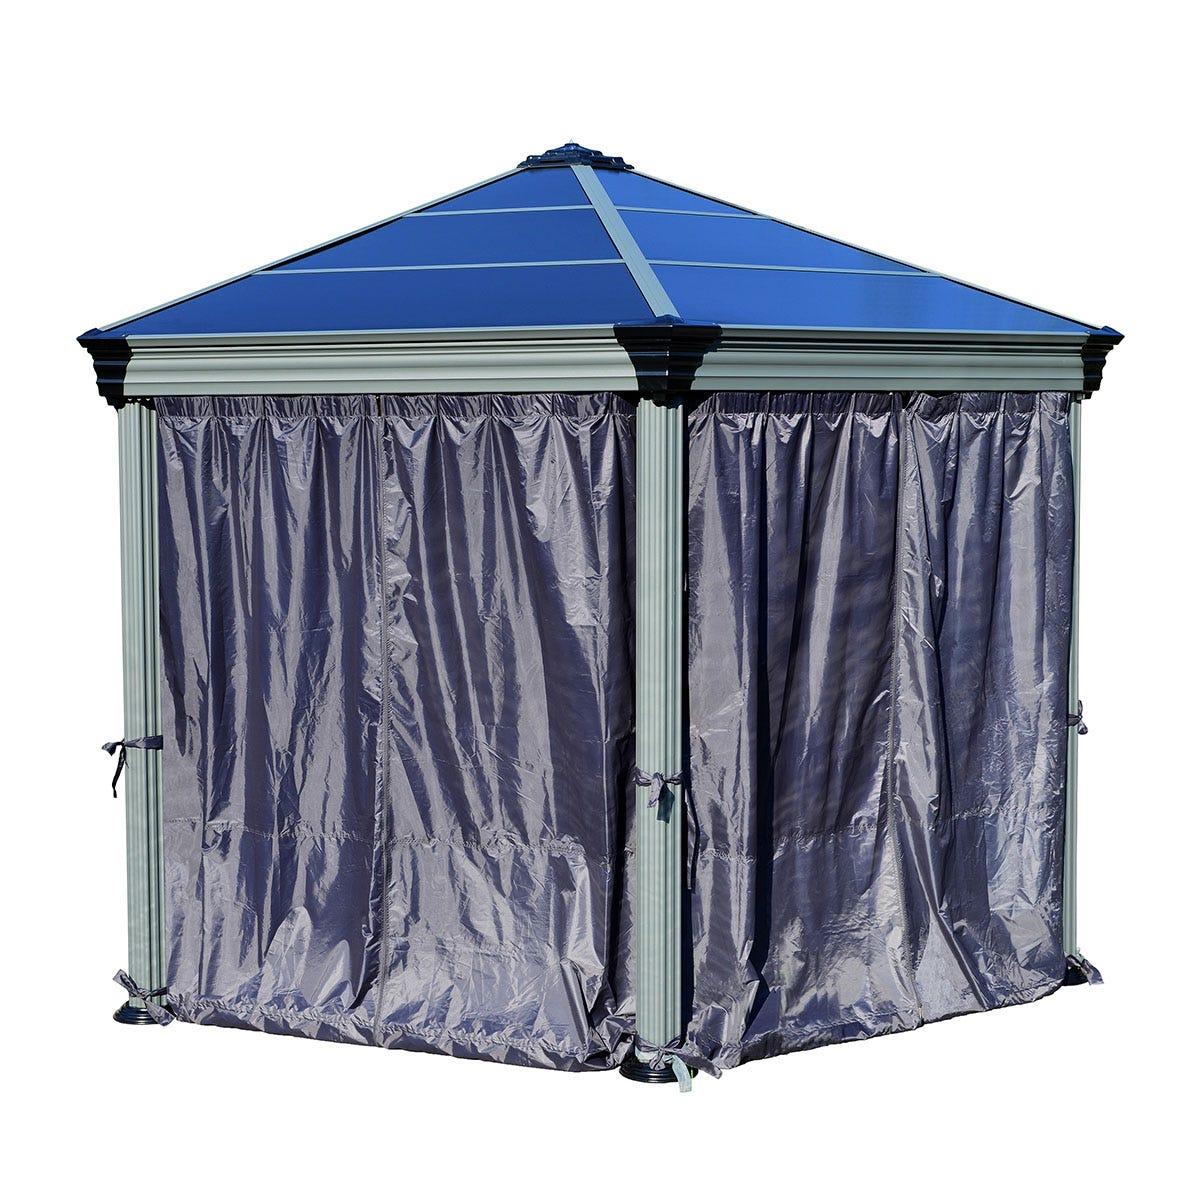 Palram - Canopia Hexagonal Gazebo Curtain Set - Black